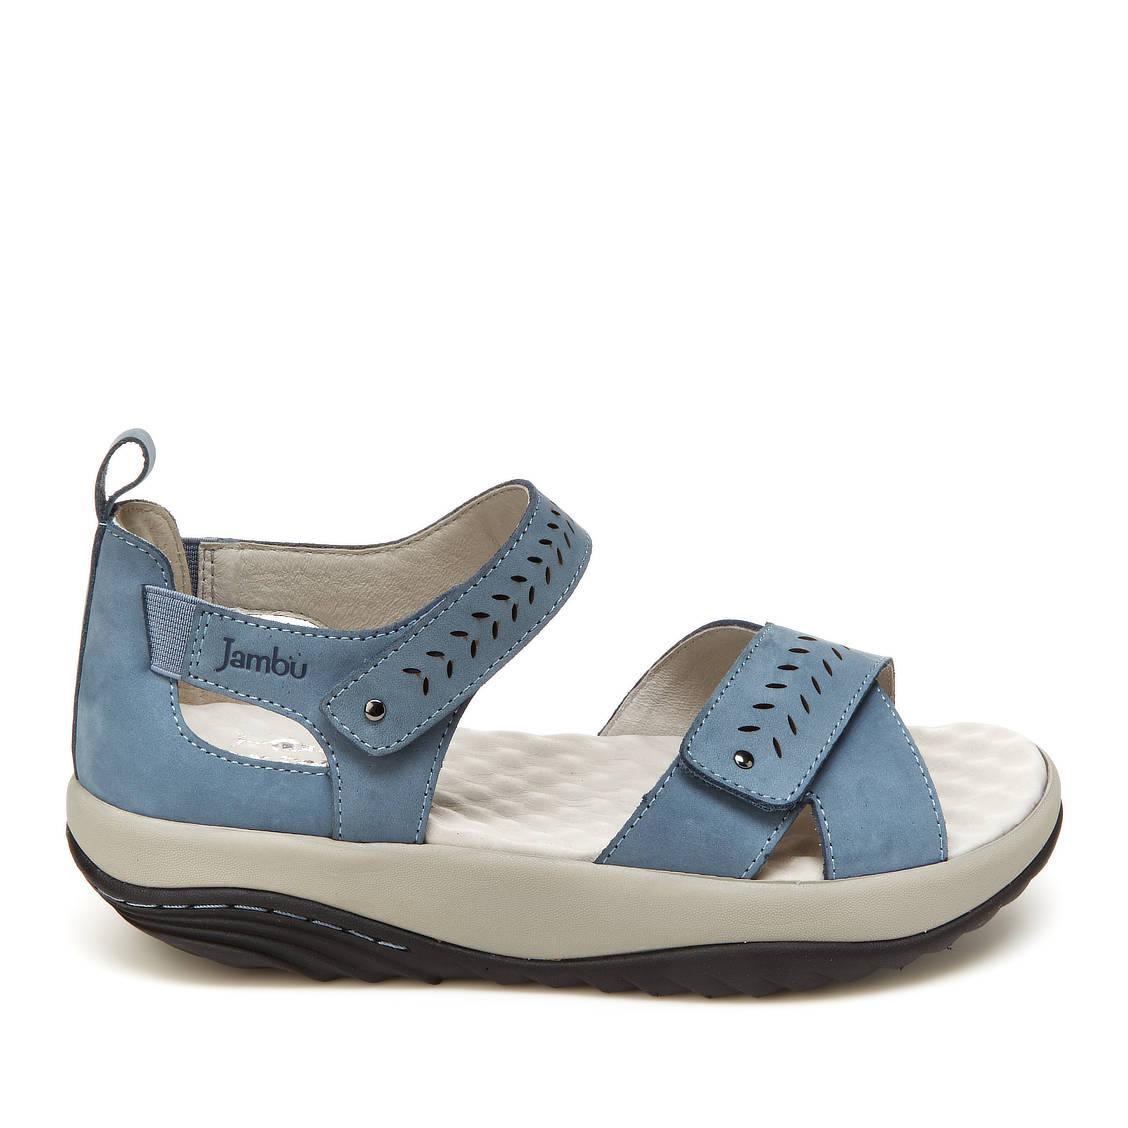 jambu-sedona-j1sed06-lt-blue-2